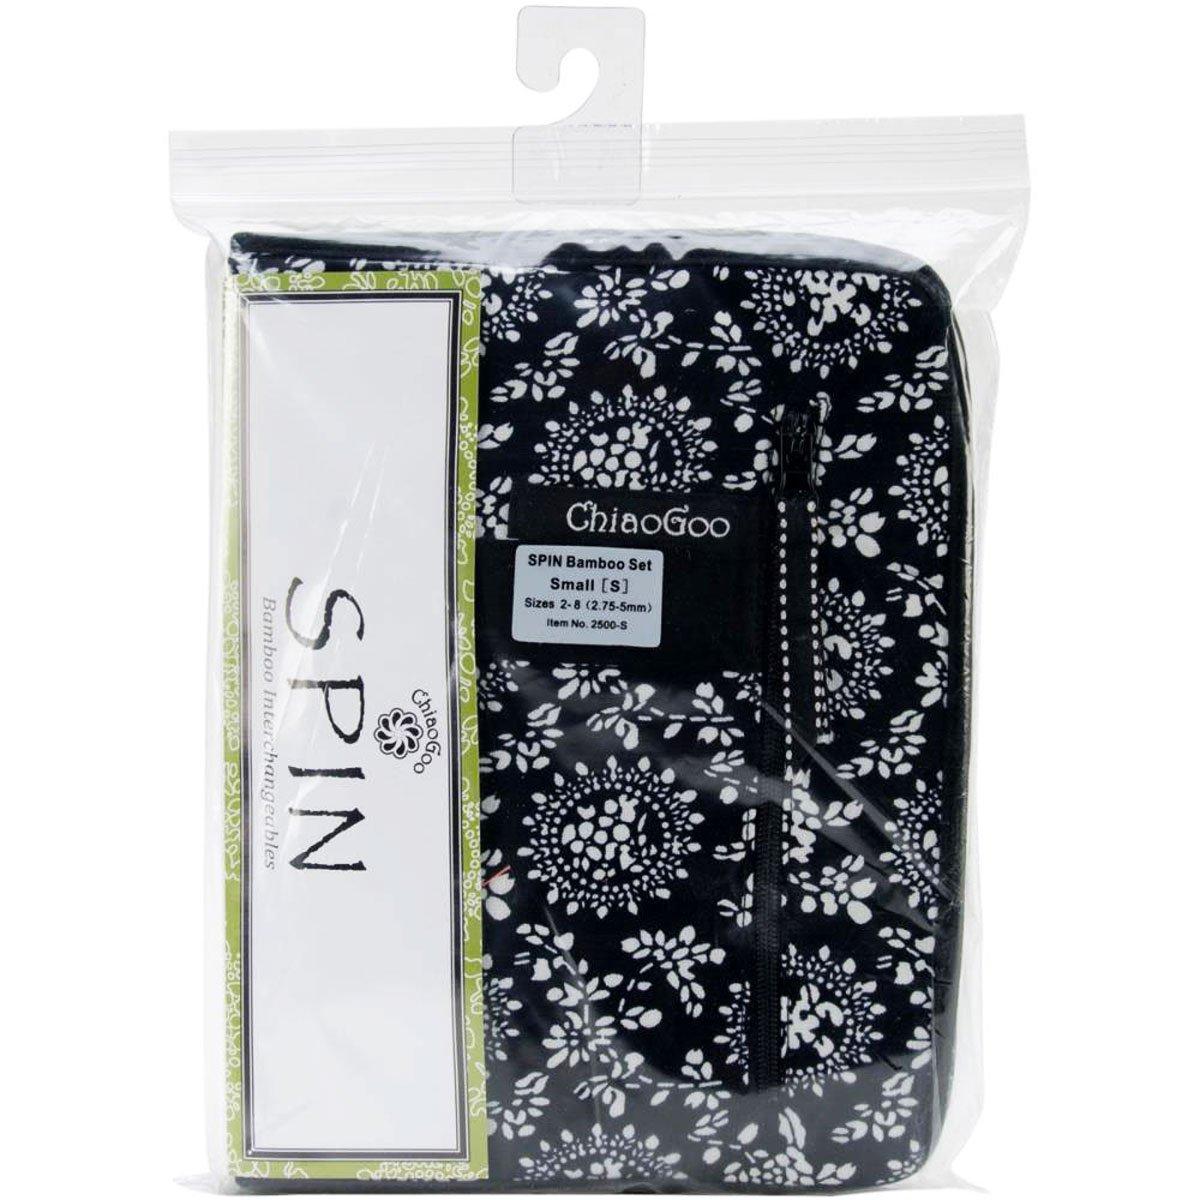 ChiaoGoo Spin Interchangeable Knitting Needle Set Small Needles: Size US 2 (2.75mm)-Size US 8 (5mm) Bundle with 1 Artsiga Crafts Project Bag 2500-S by ChiaoGoo Knitting Needles (Image #2)